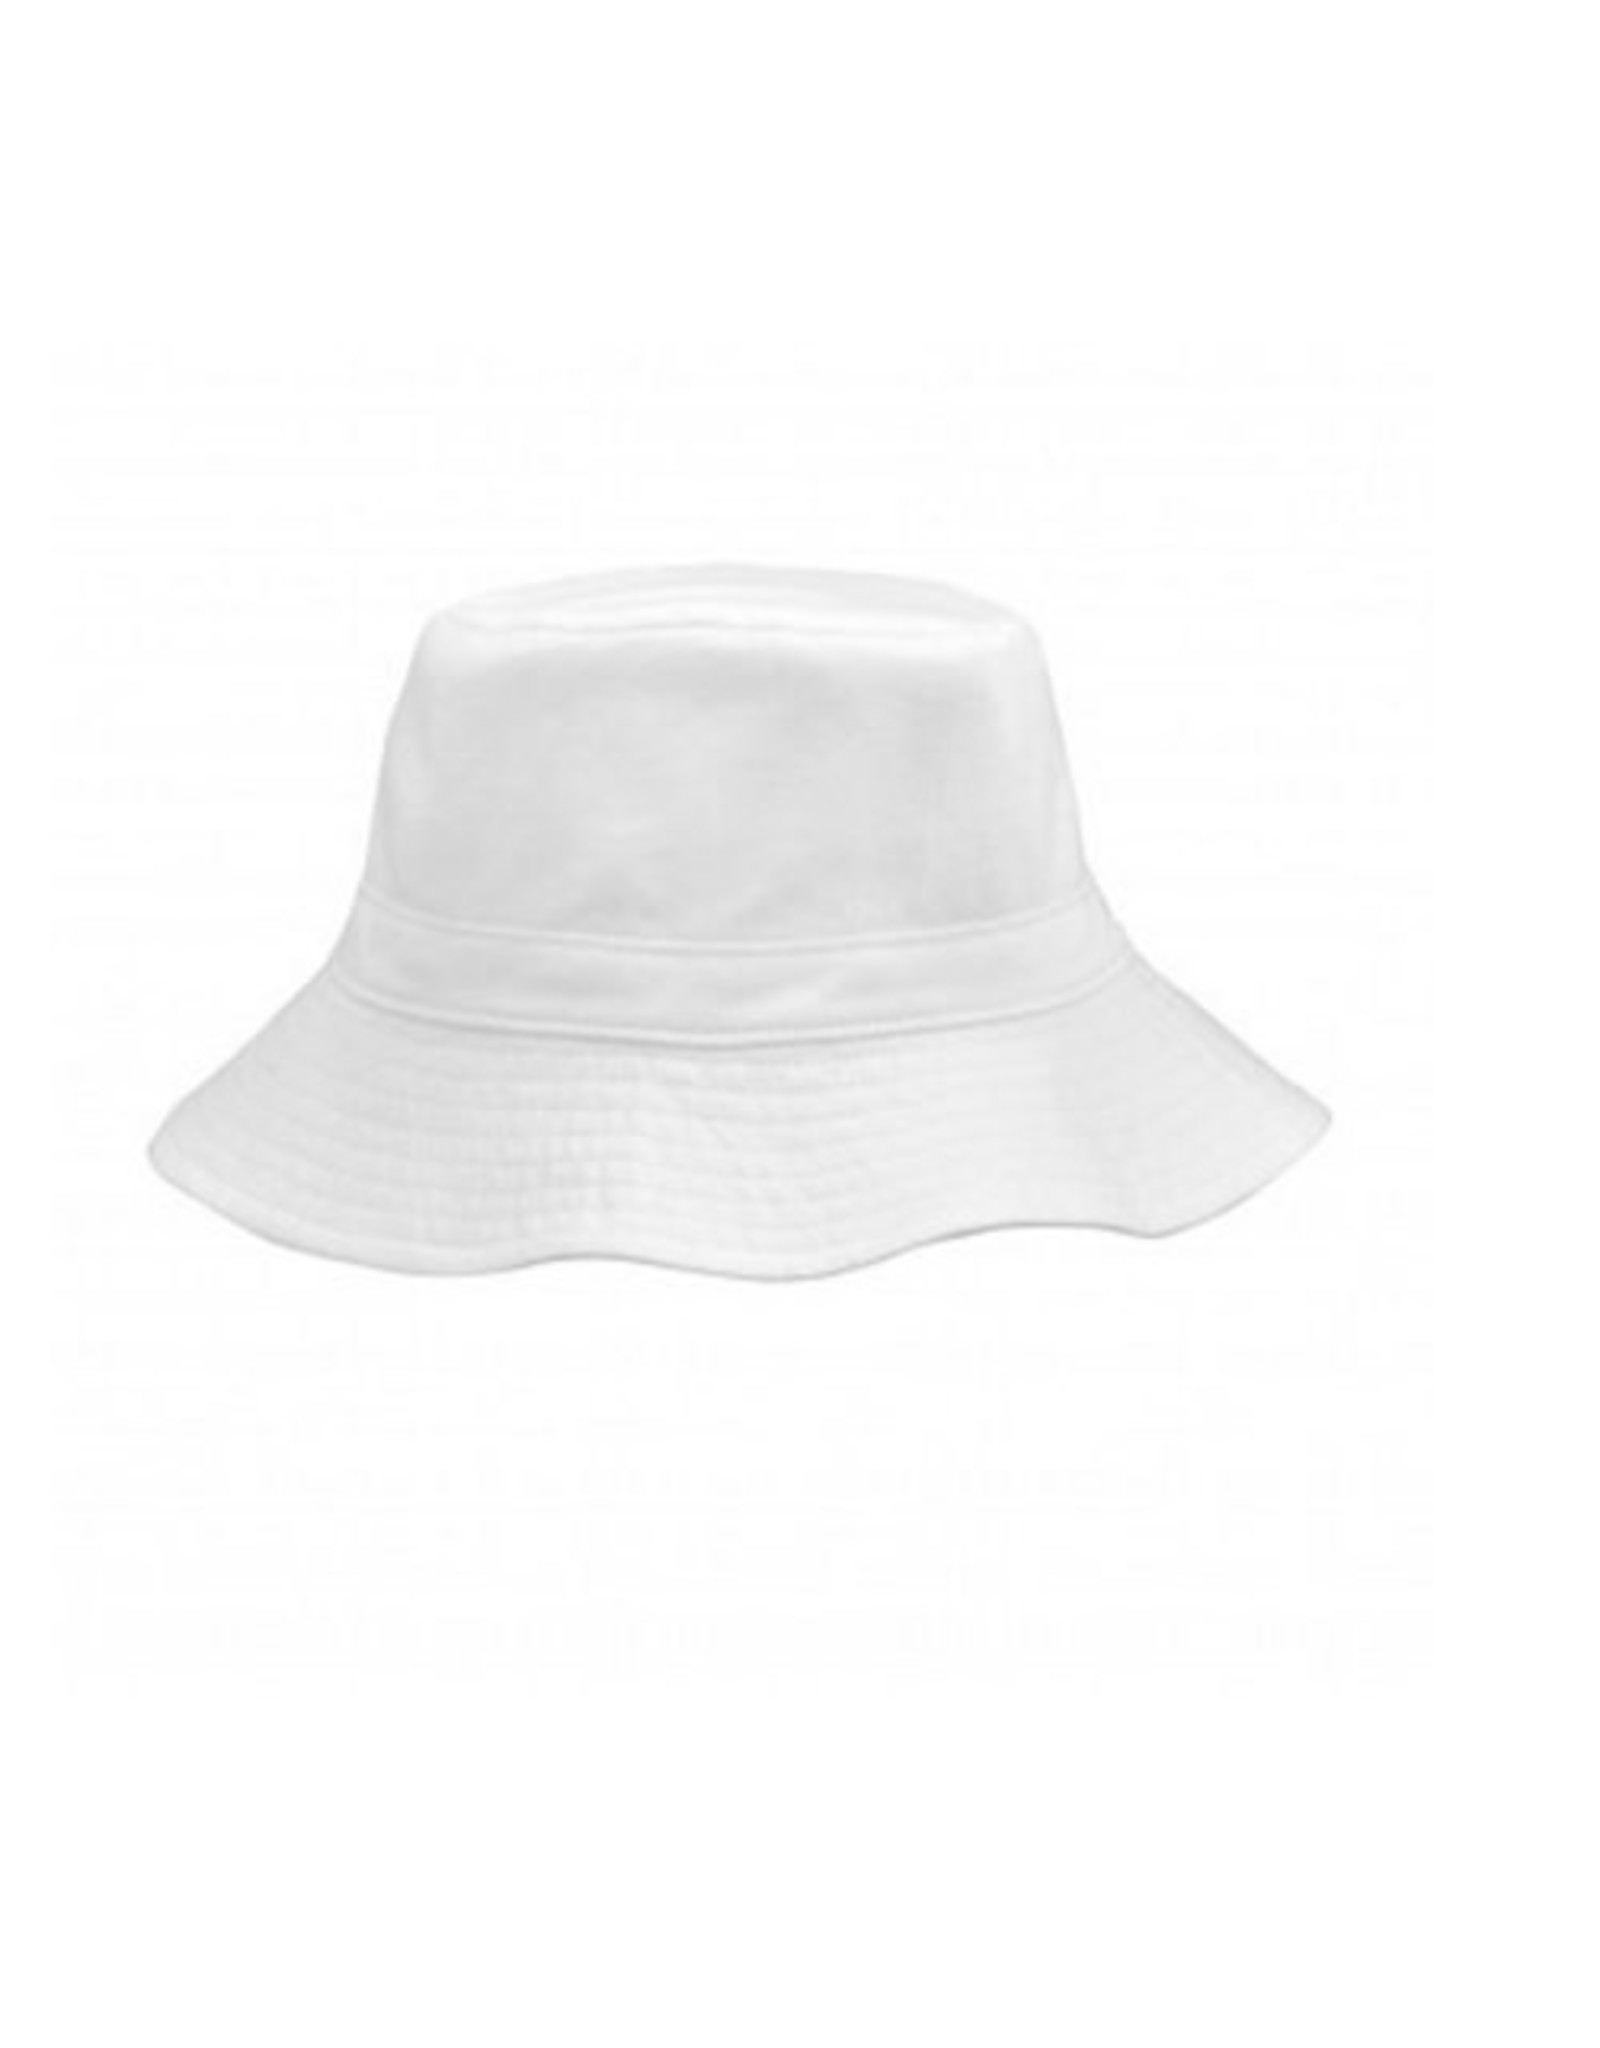 iPlay Reversible Bucket Hat, White, 9-18 months